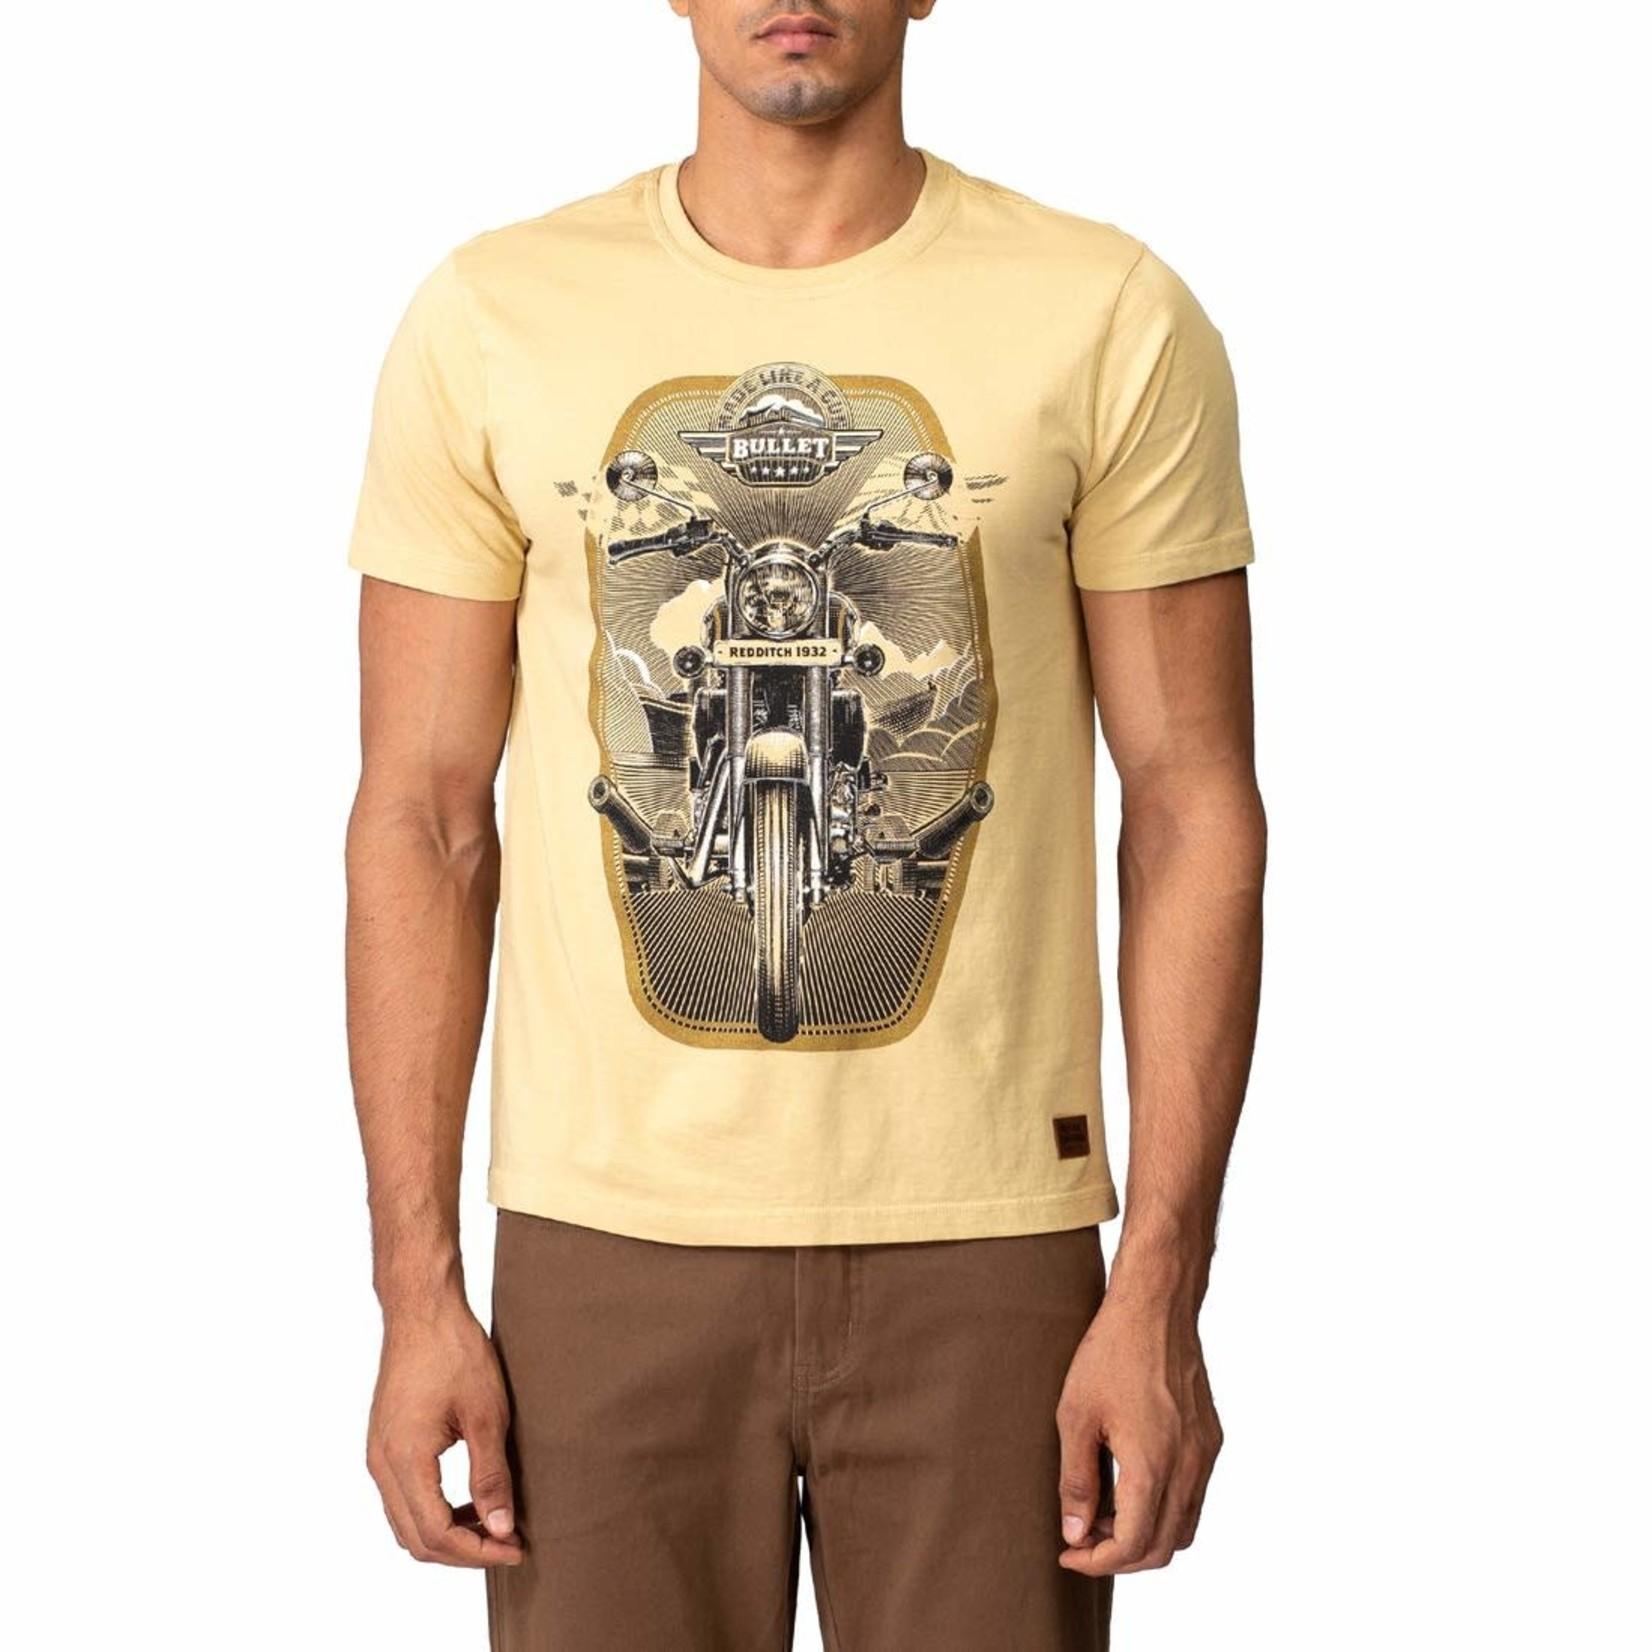 Royal Enfield Dodge the Bullet Crew- RE Shirt